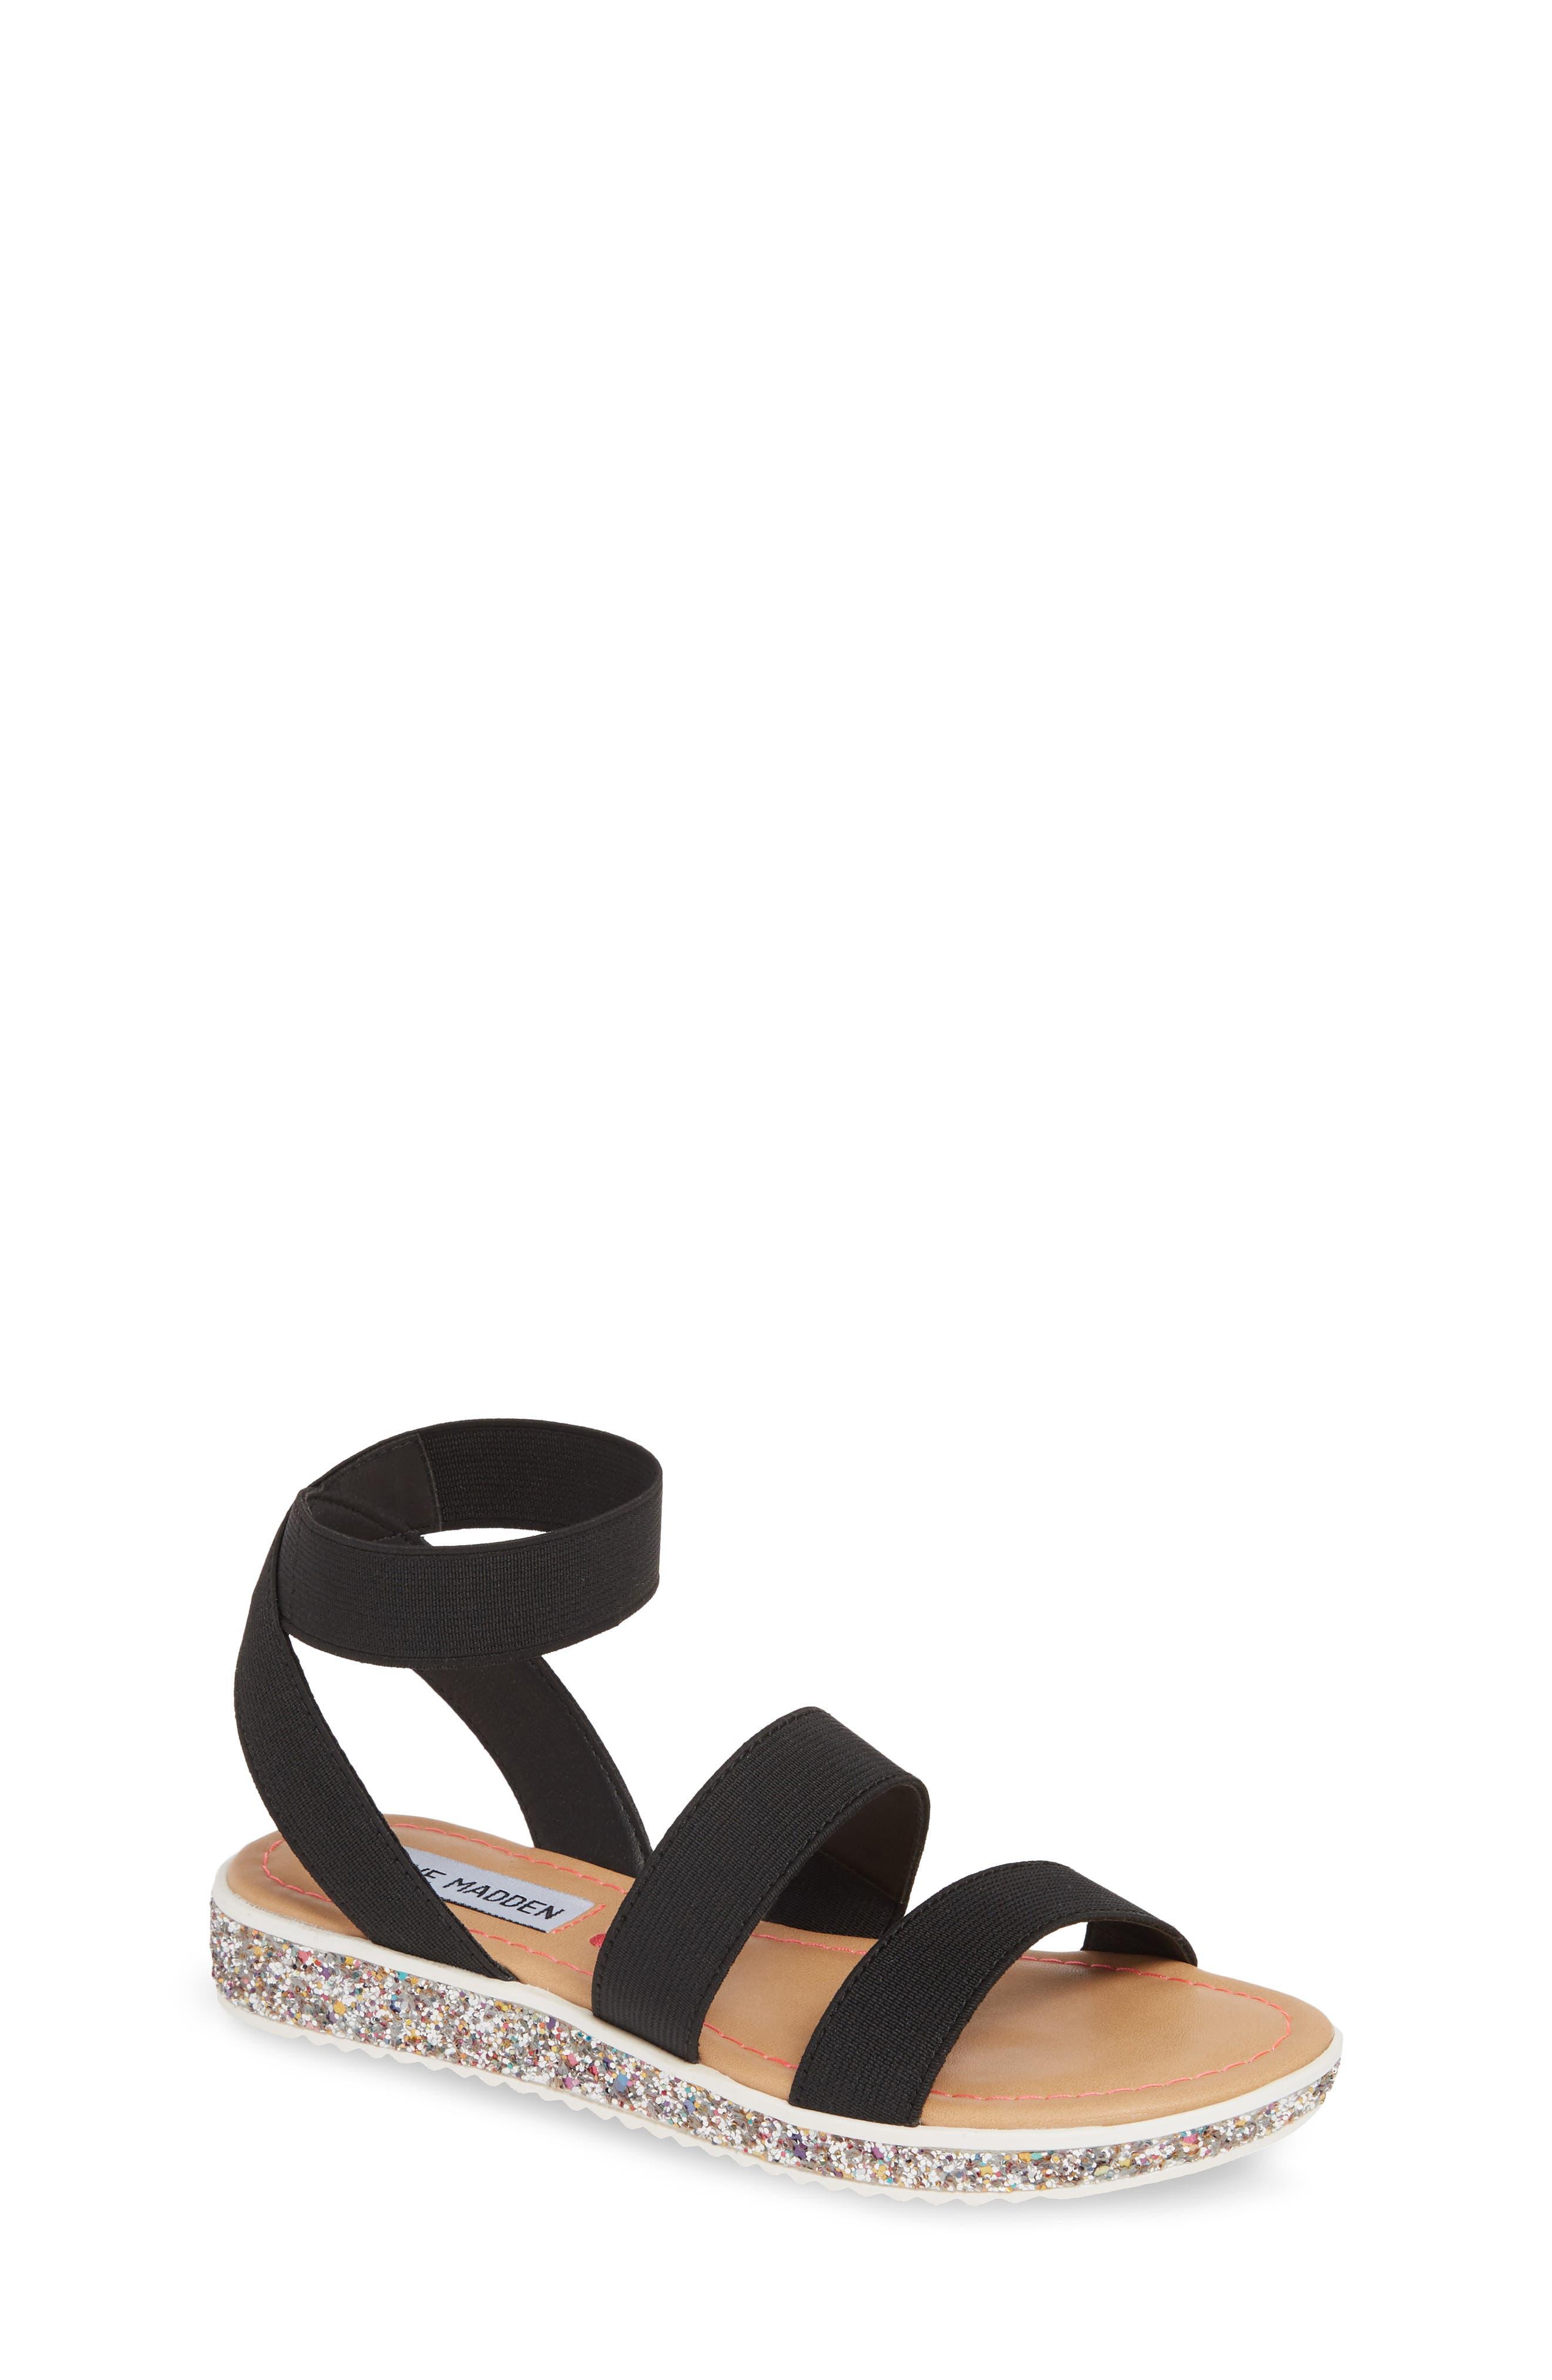 JKIMMA Glitter Sandal, Main, color, BLACK